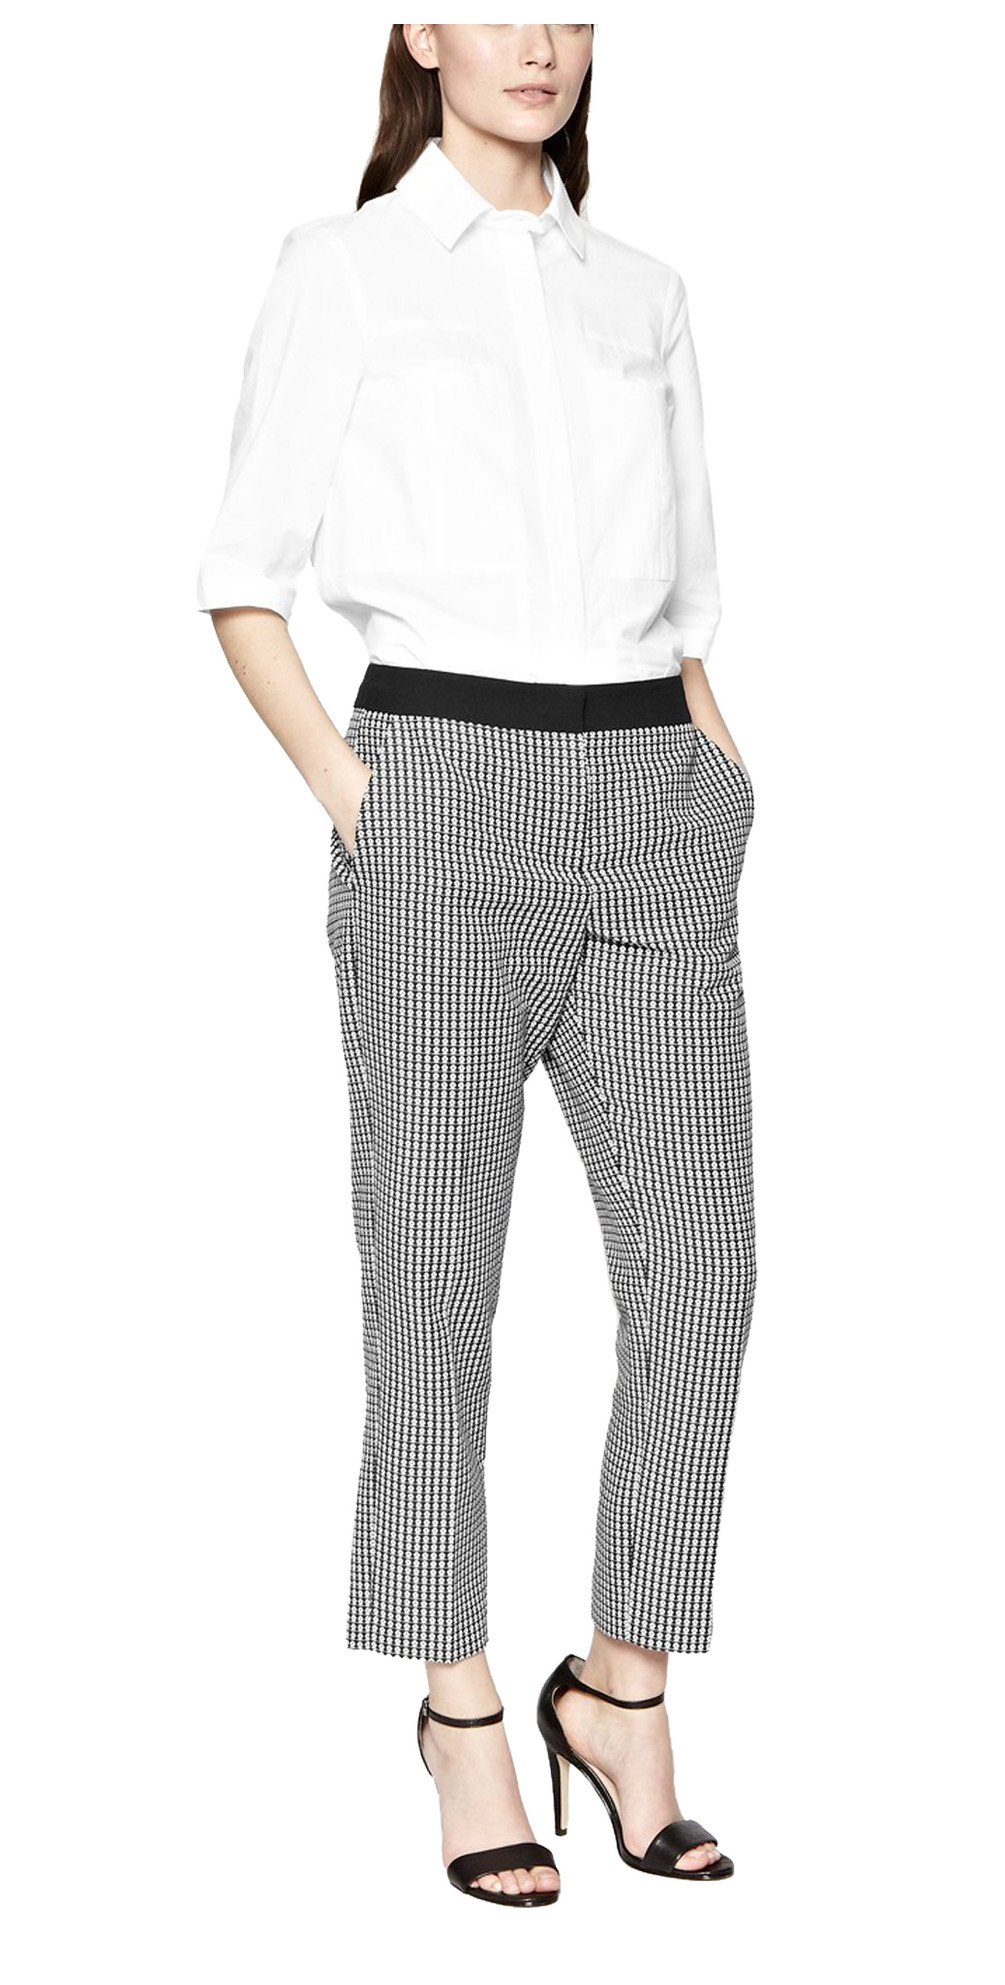 Jolie Jacquard Trousers main image